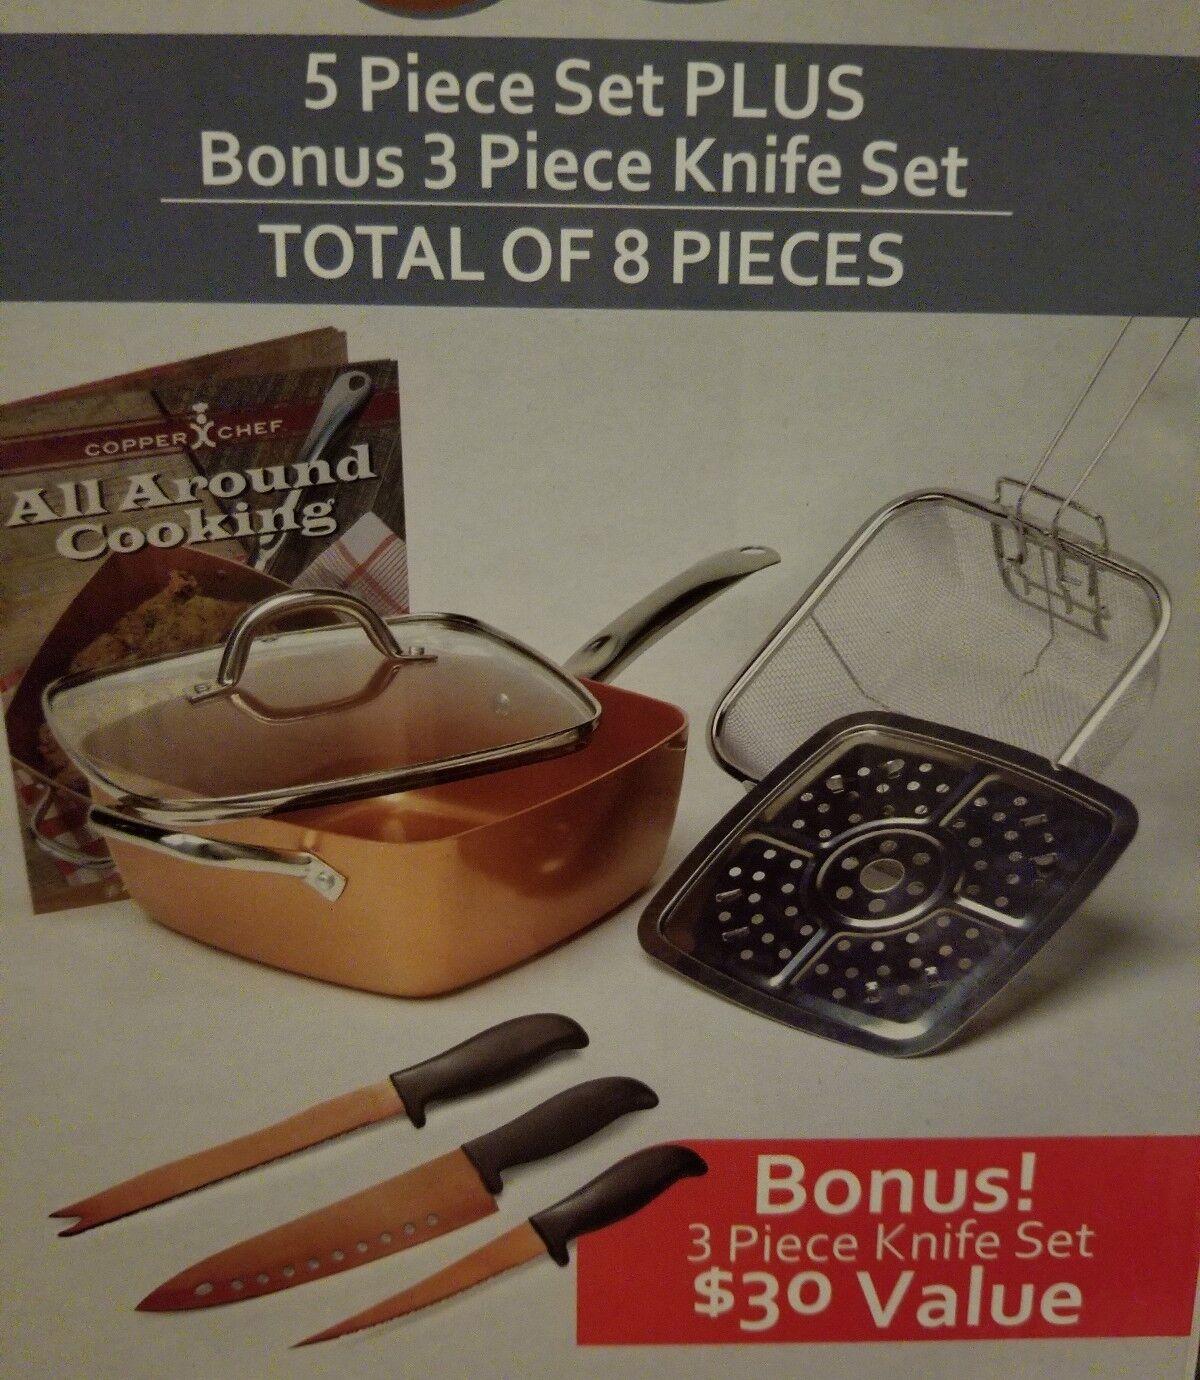 Copper Chef cookware set Including 3 Piece Knife Set And Recipe Cookbook